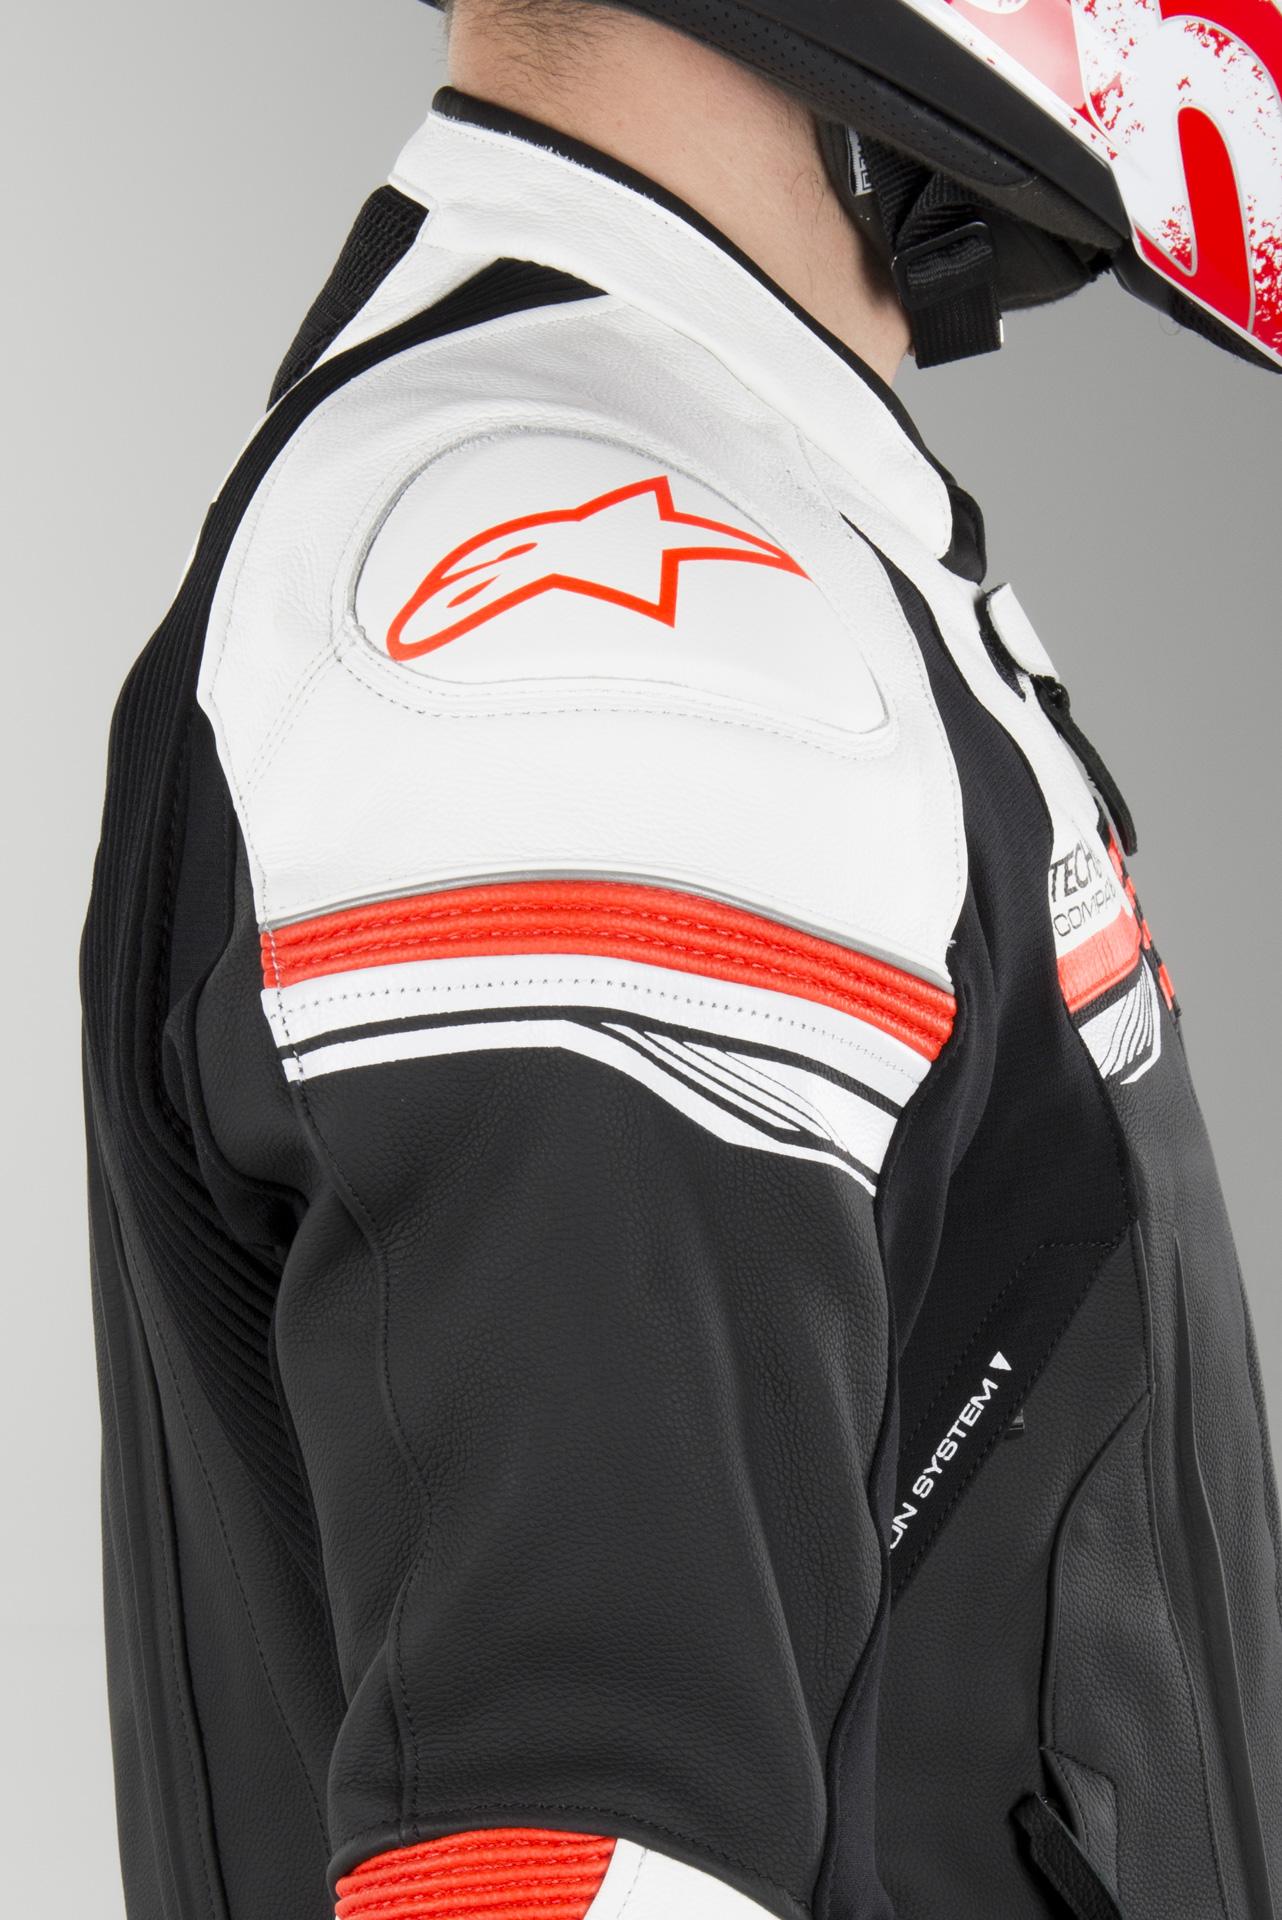 Skinnjakke Alpinestars GP R V2 Tech Air® Svart Hvit Rød Fluo